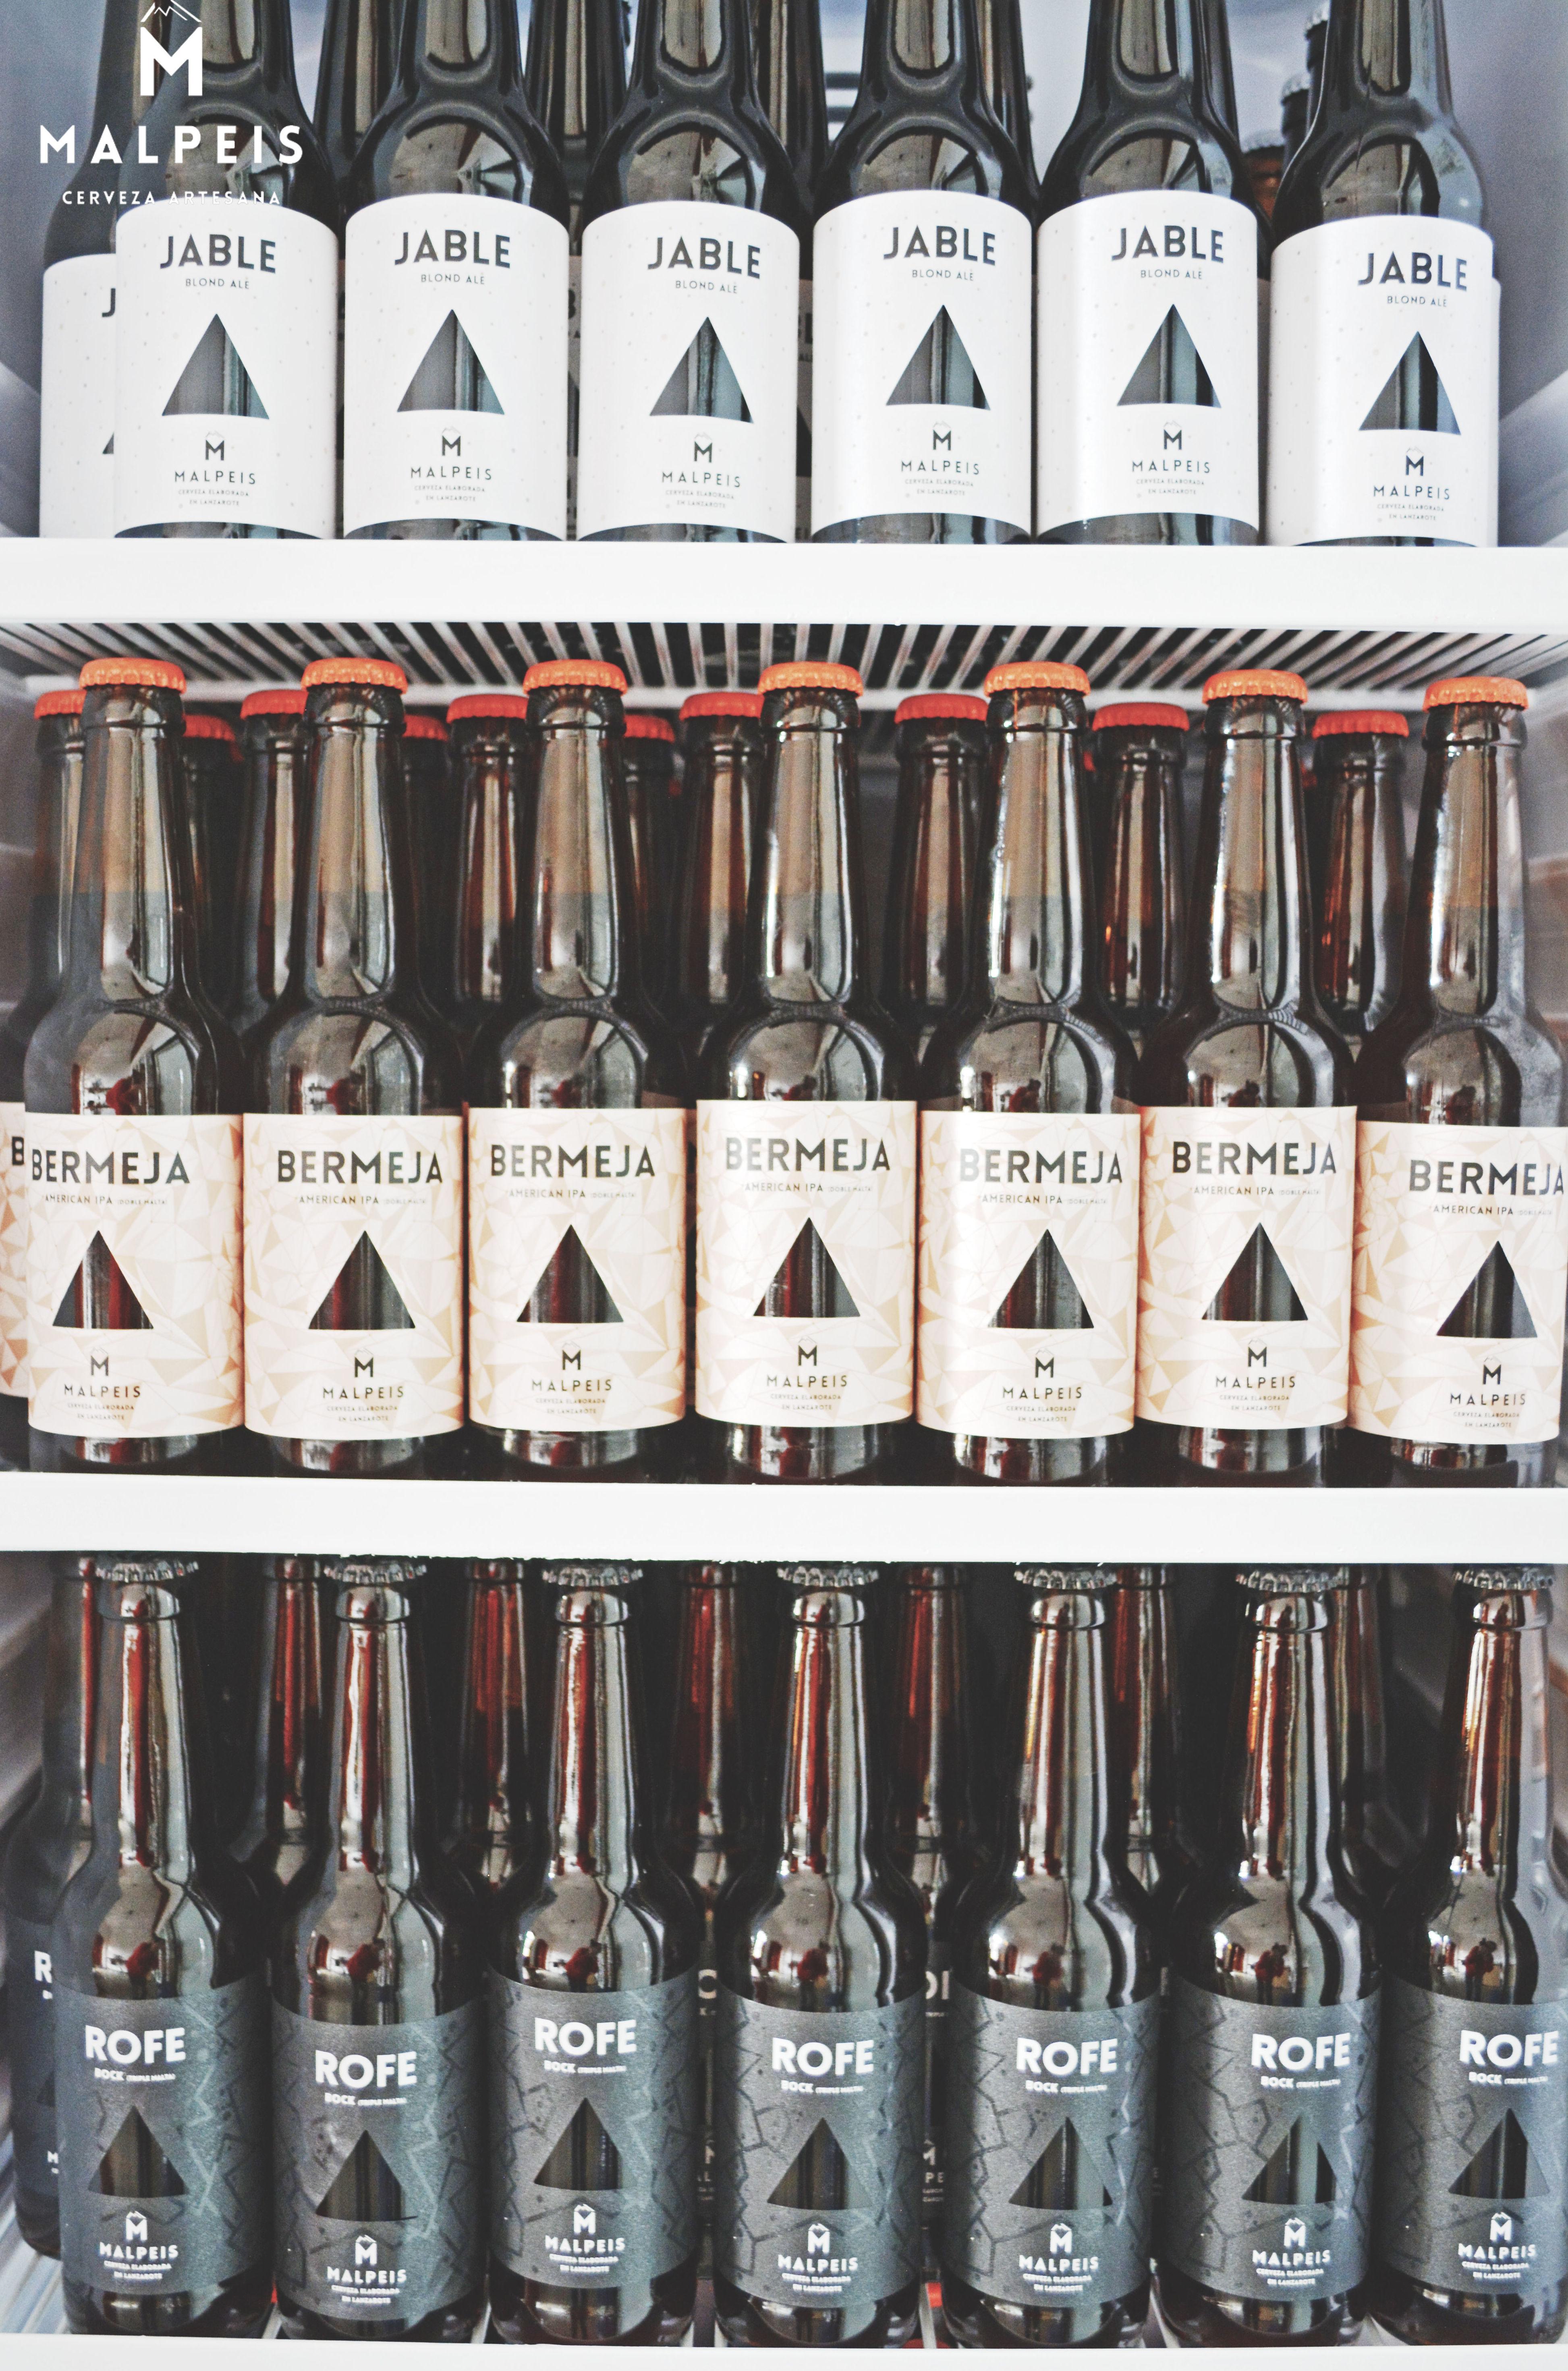 Cervezas artesanas en Las Palmas